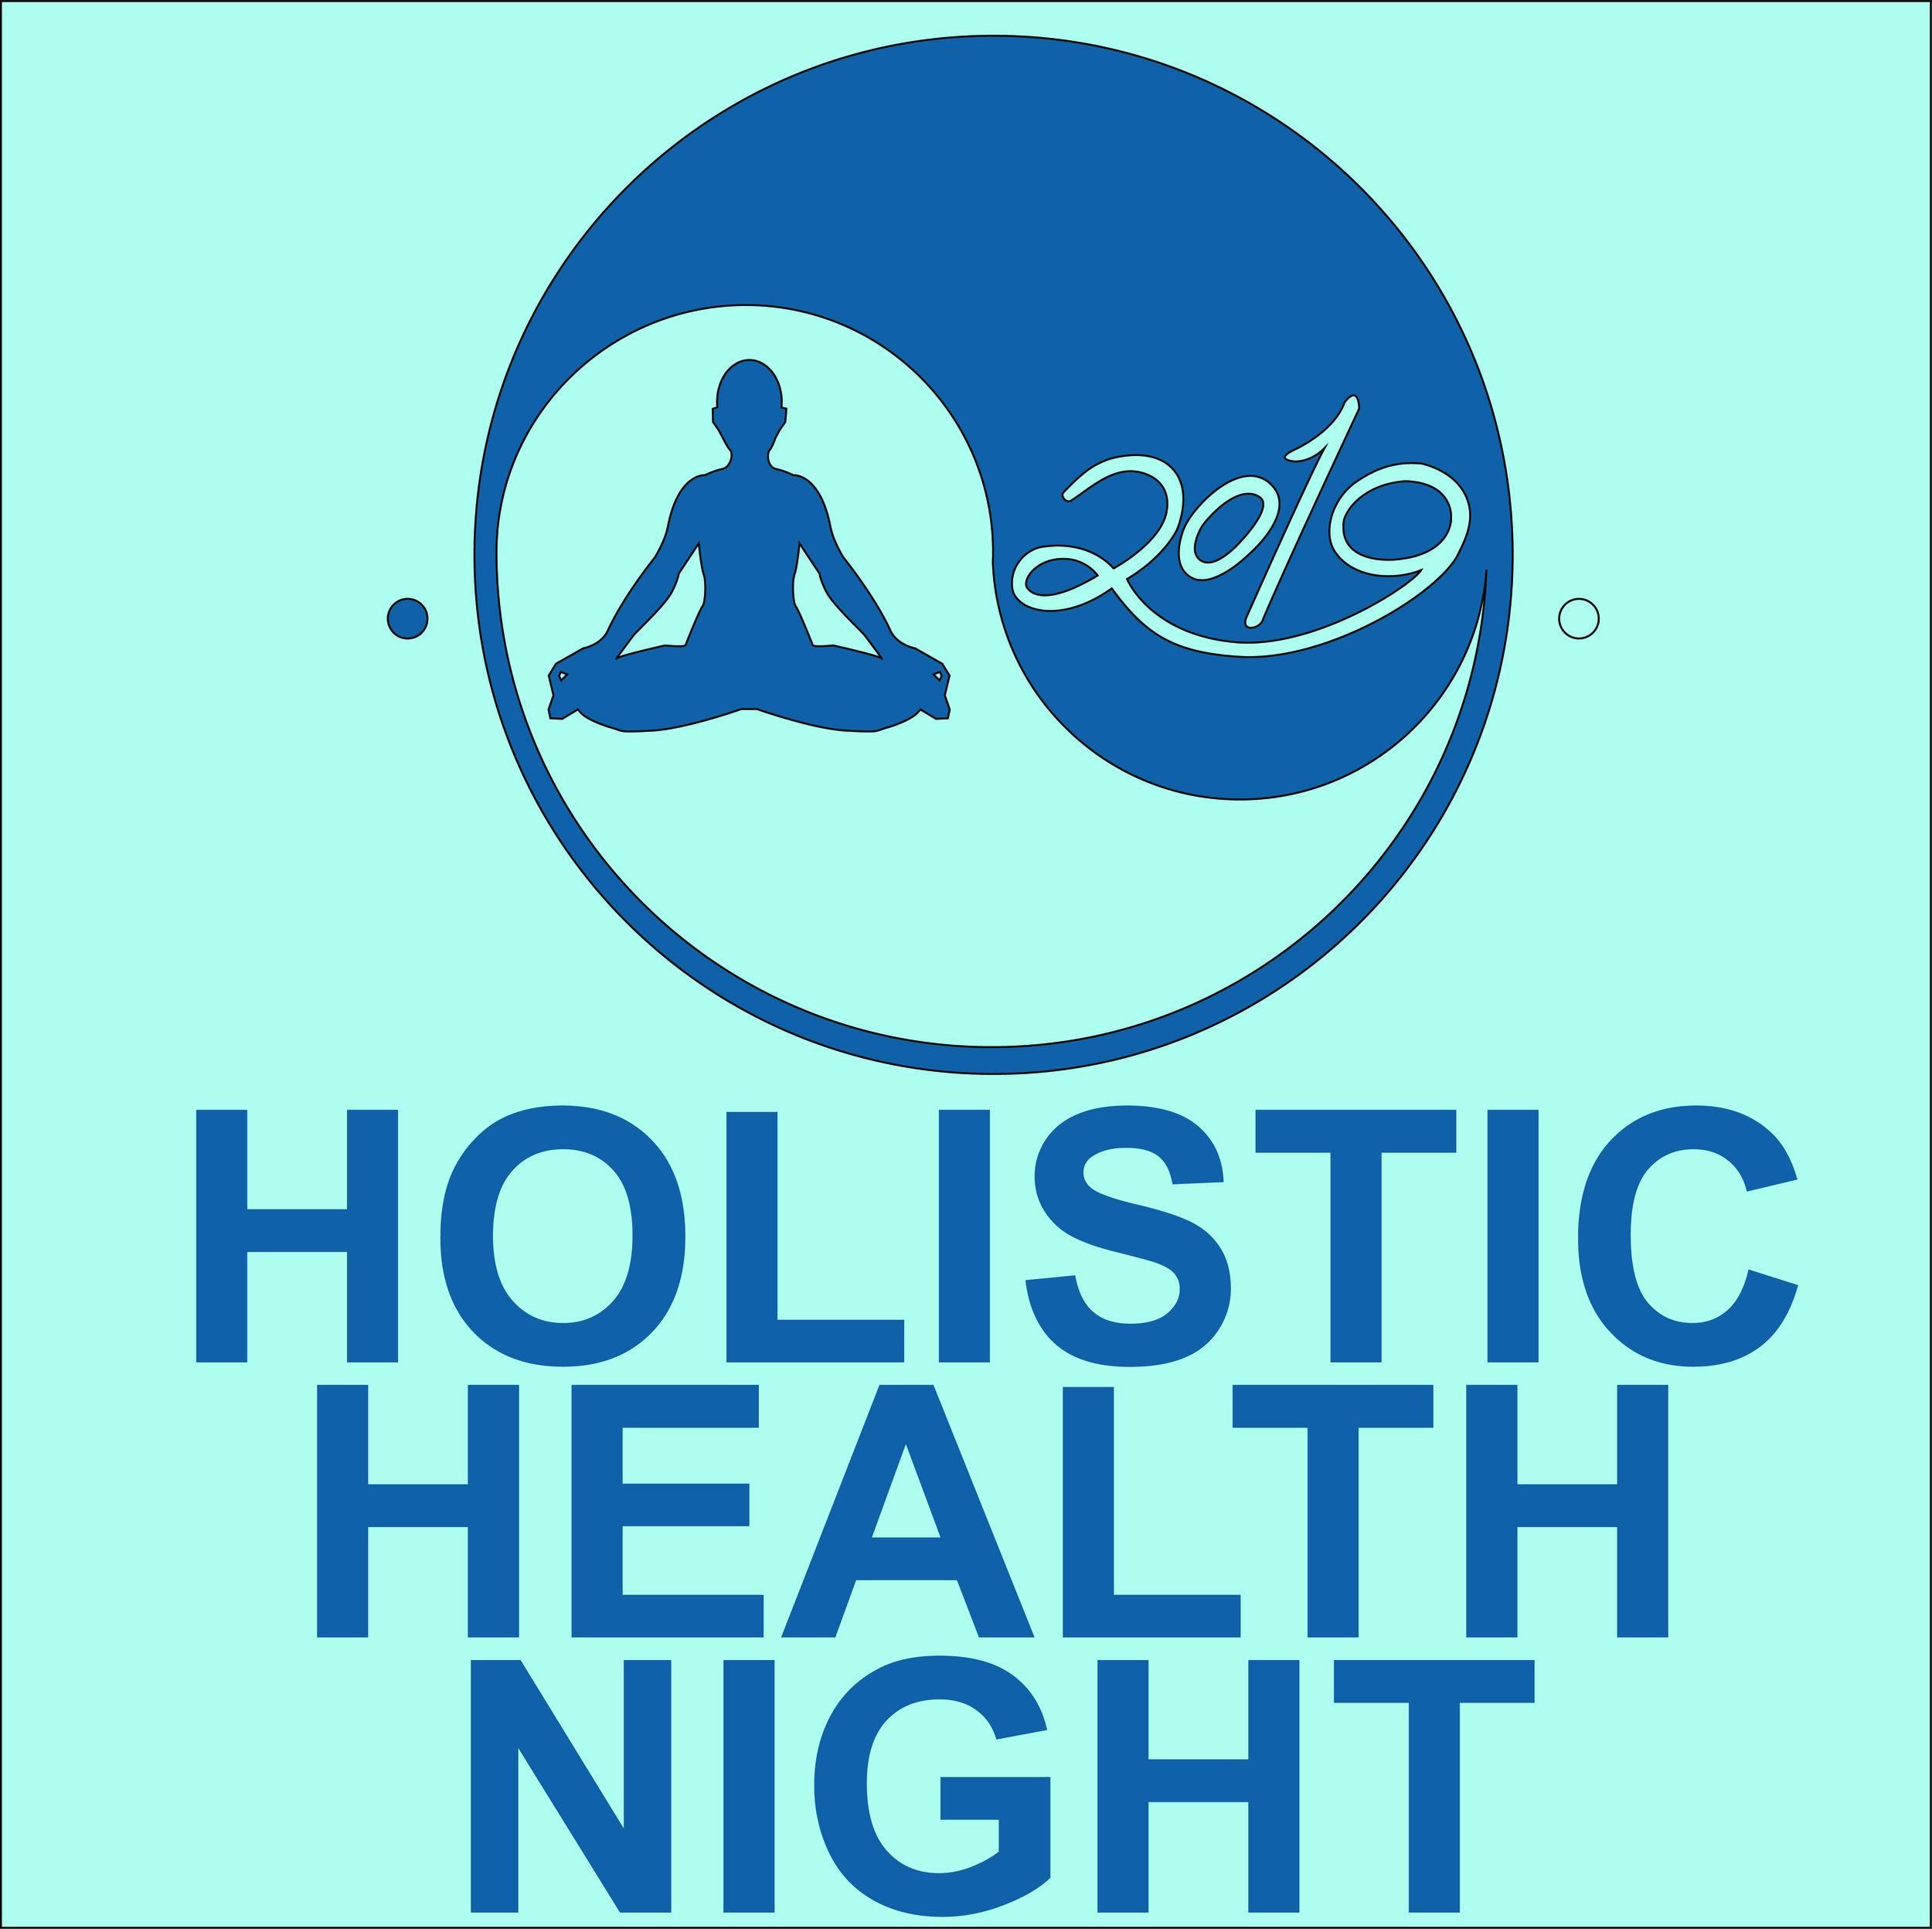 holistichealth1080.jpg